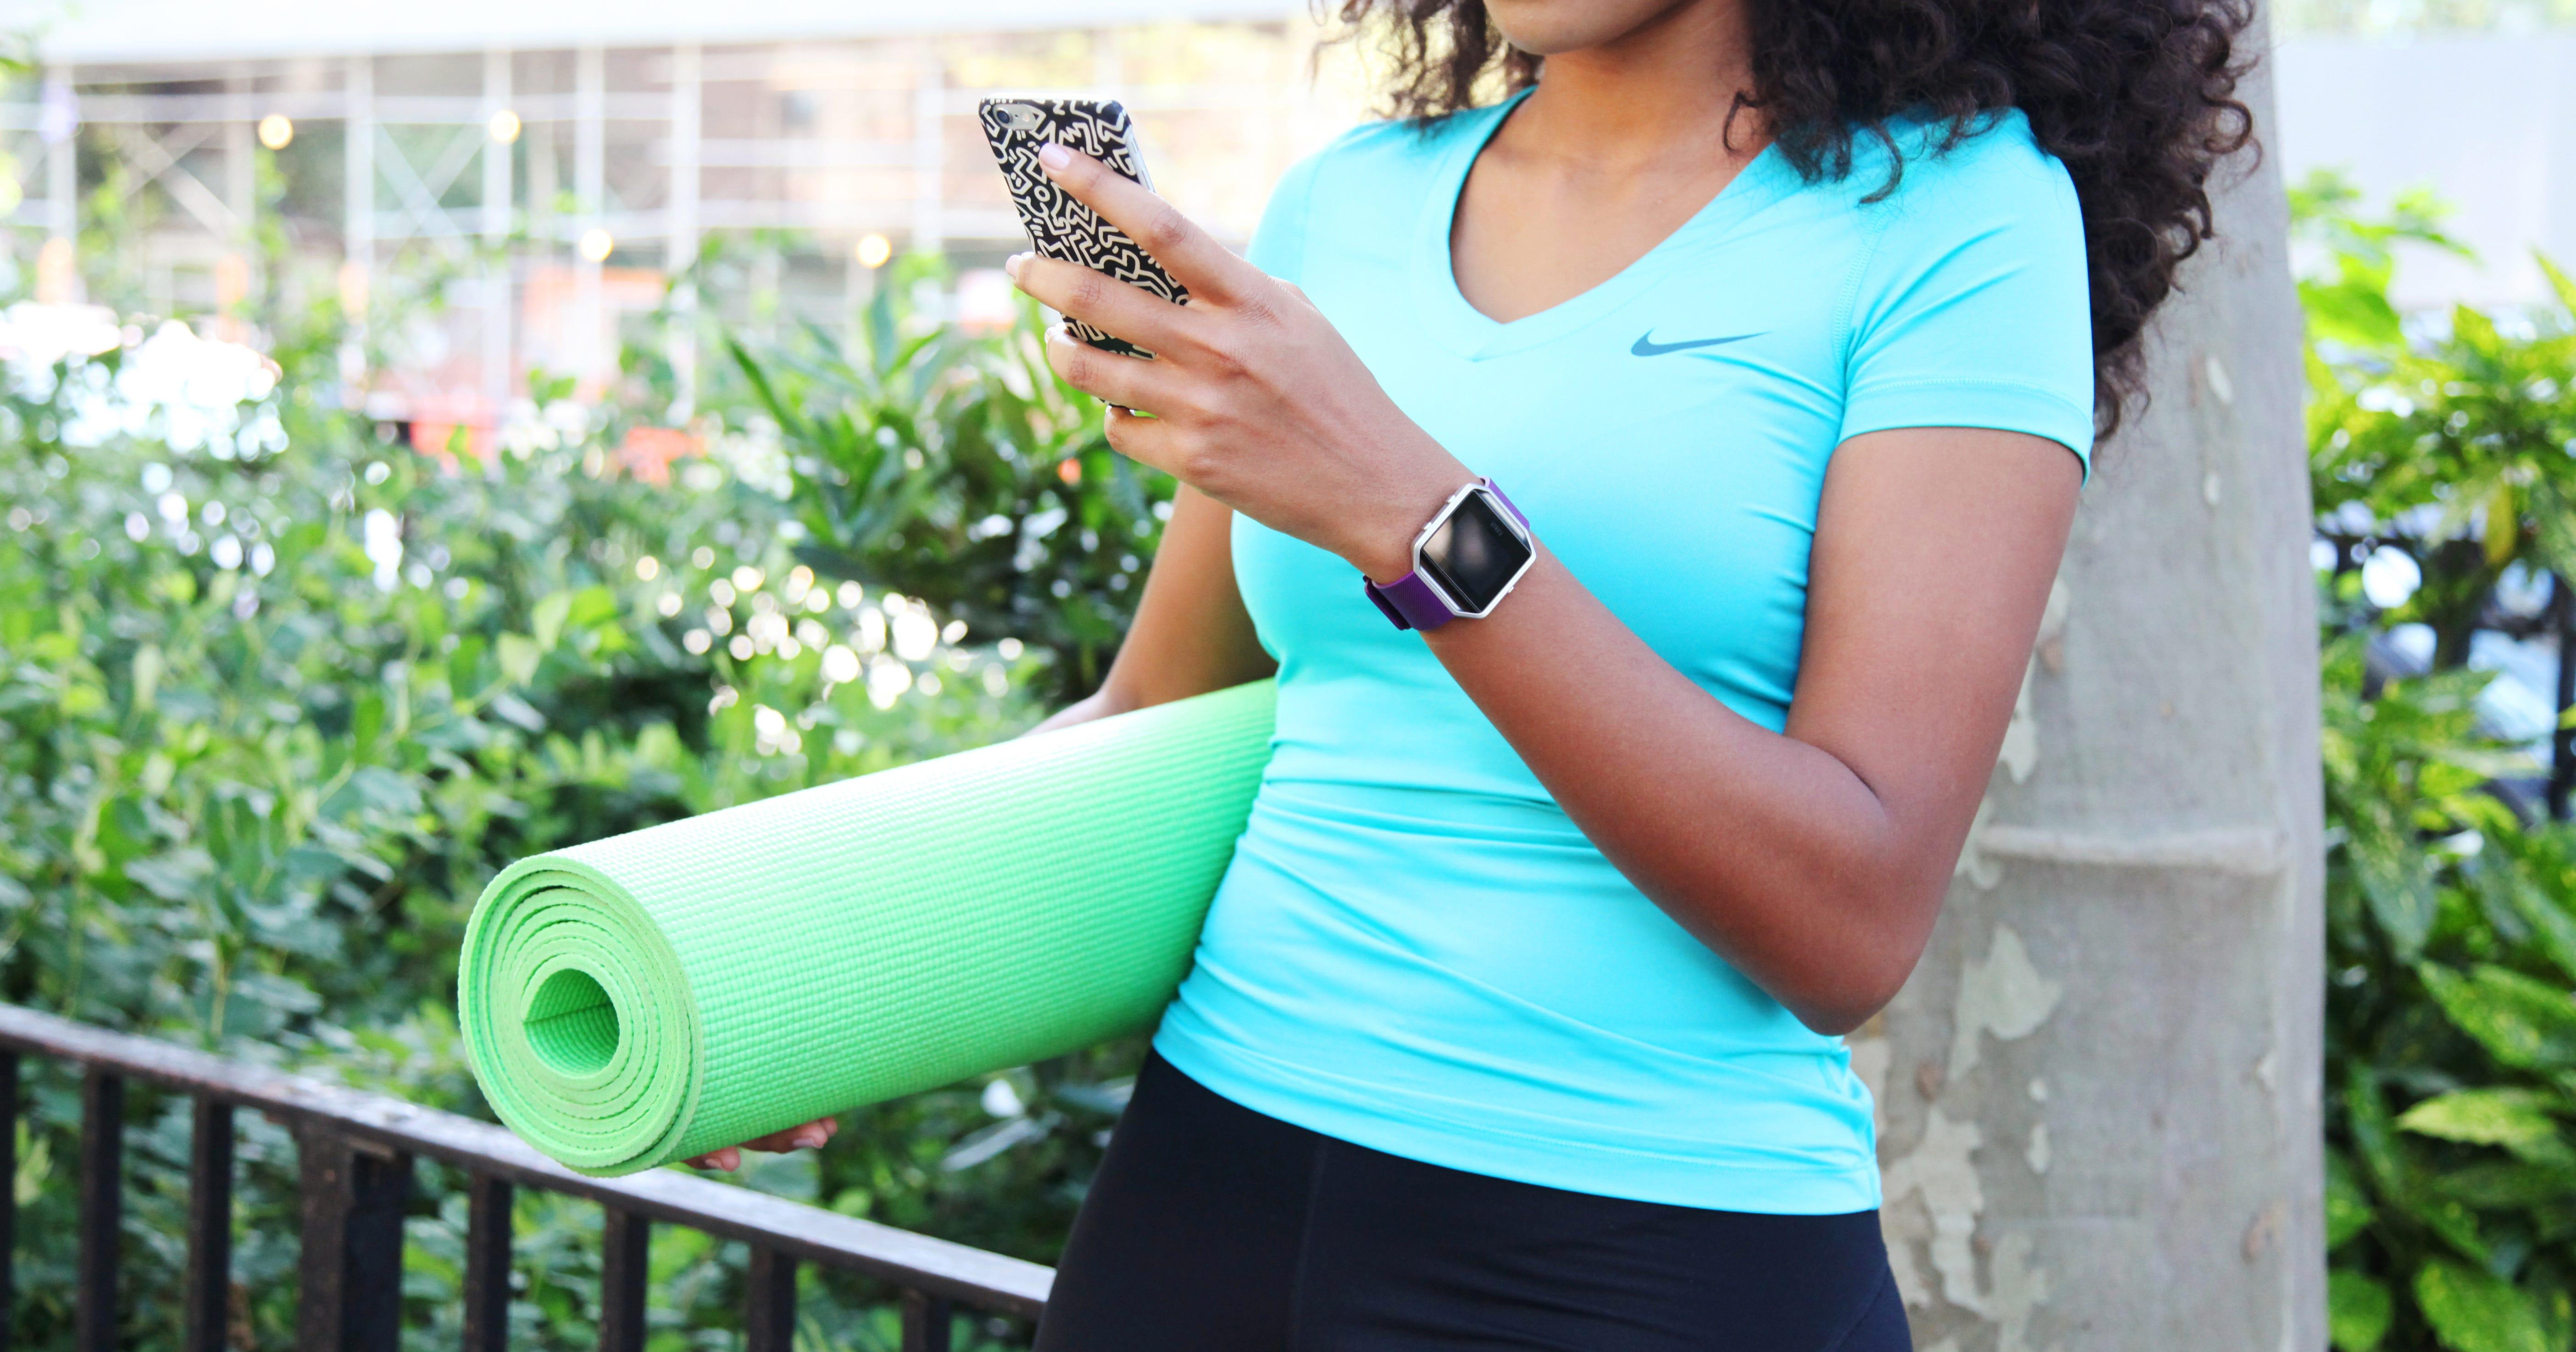 b63306f67b2 Best Female Fitness Instagram Accounts To Follow 2018